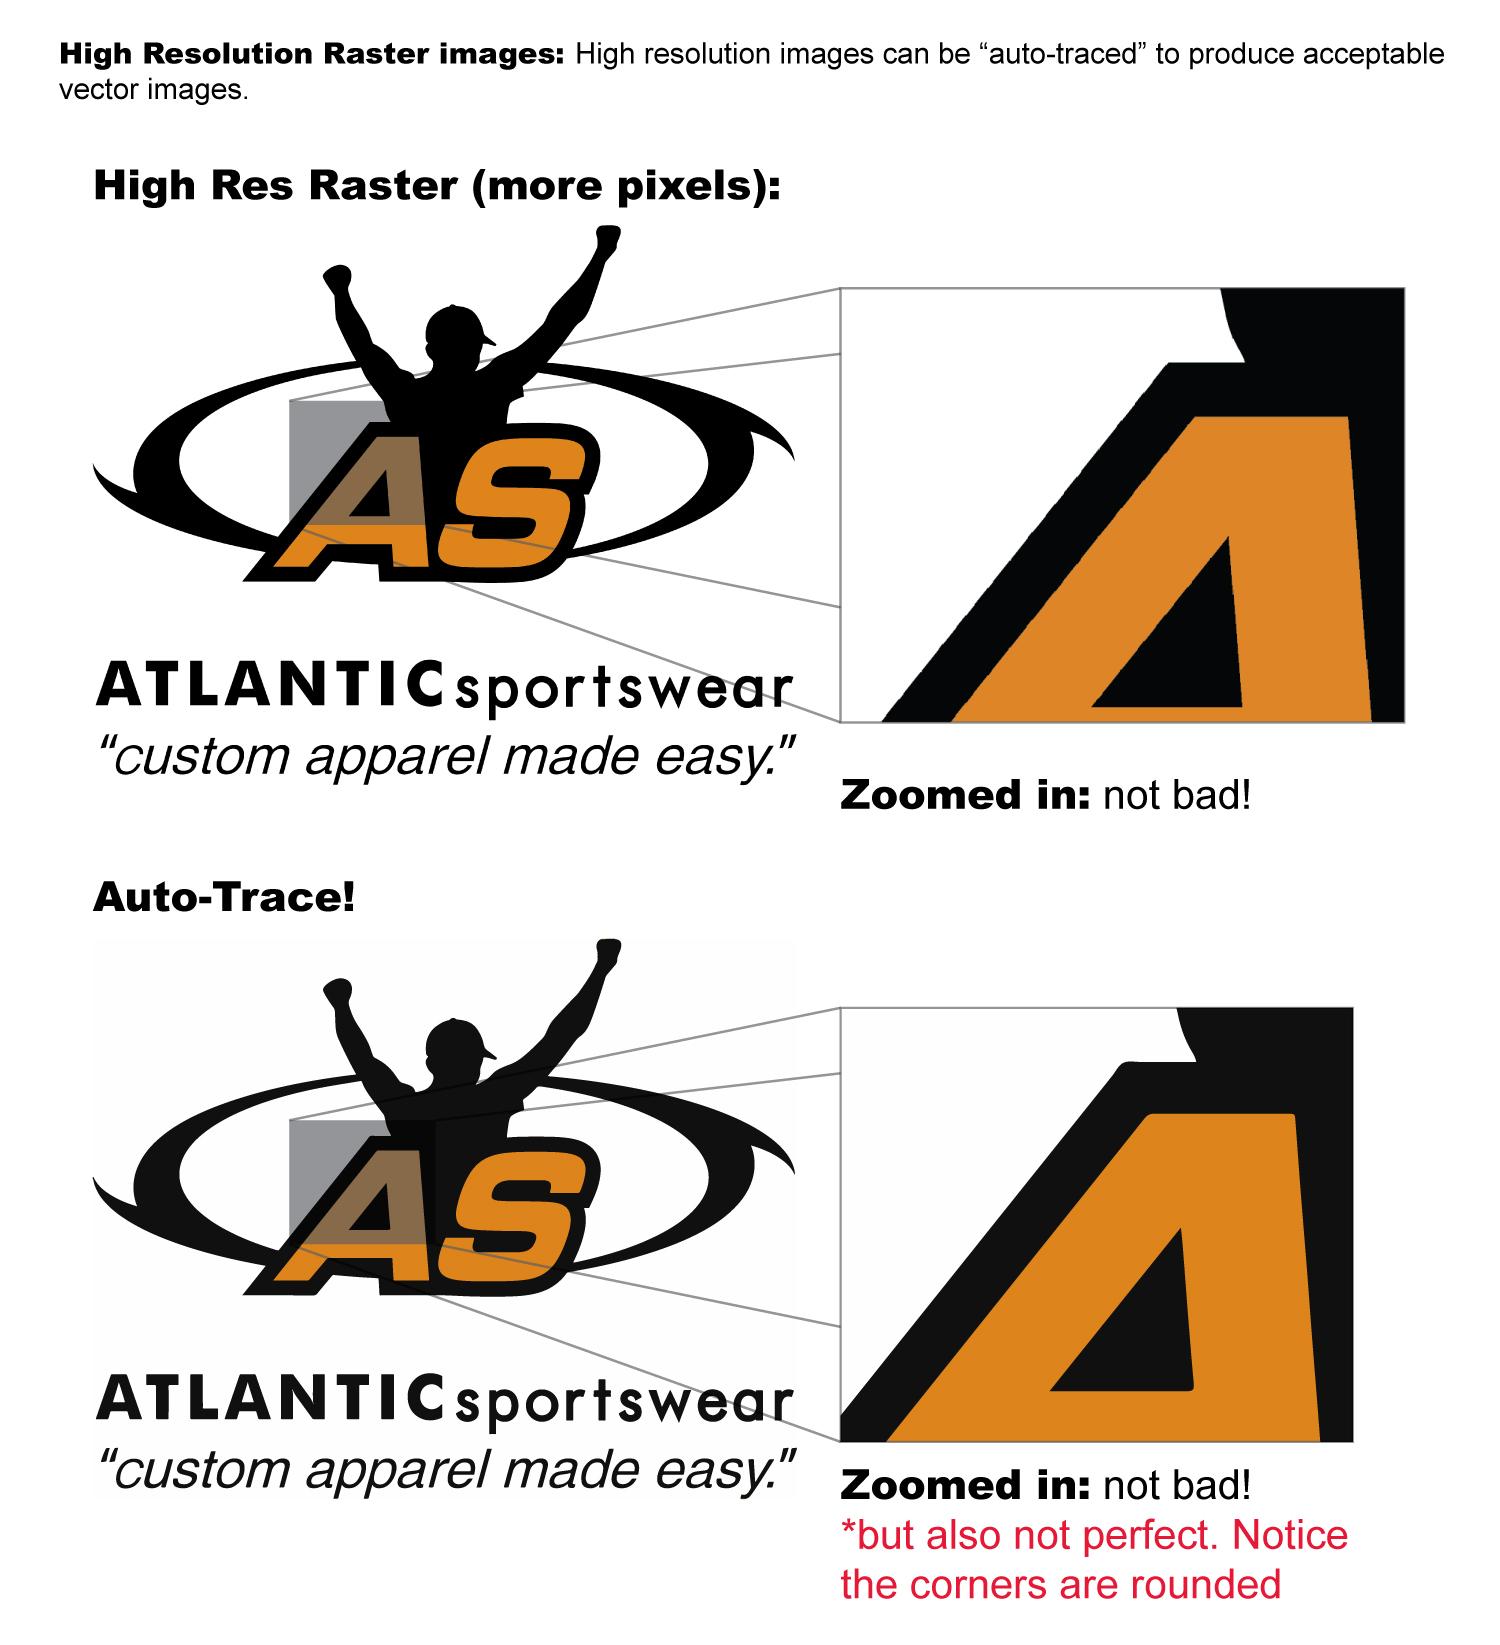 a59d95c6bc6 1-Vector-Art-Cheat-Sheet-(JKatie Michie2017-05-01T18:19:25+00:00